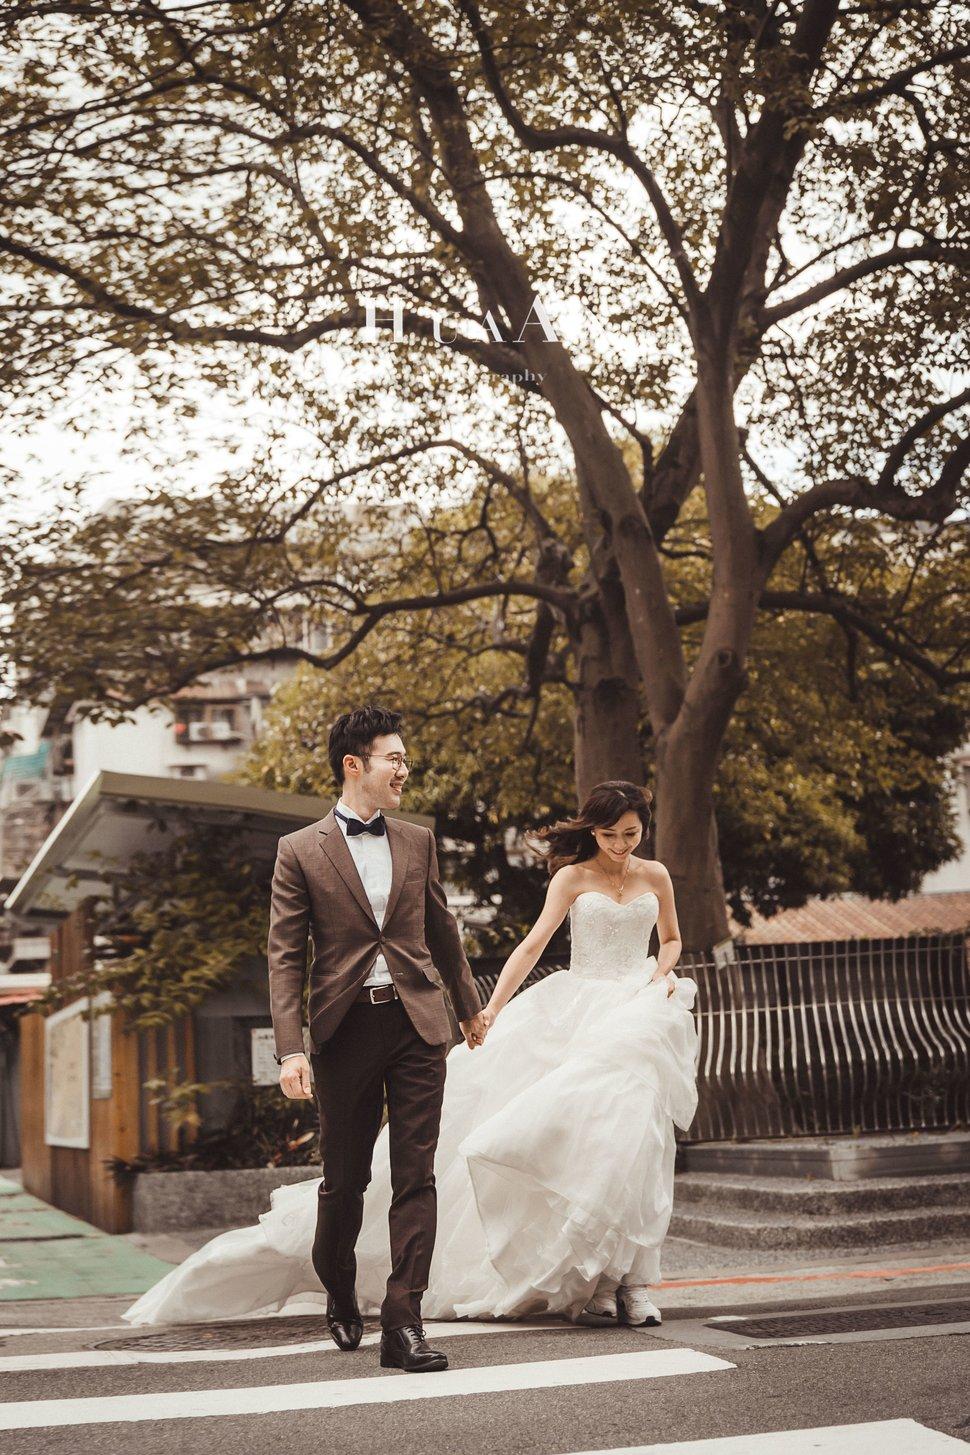 HUA00860 - Huaan Photography《結婚吧》